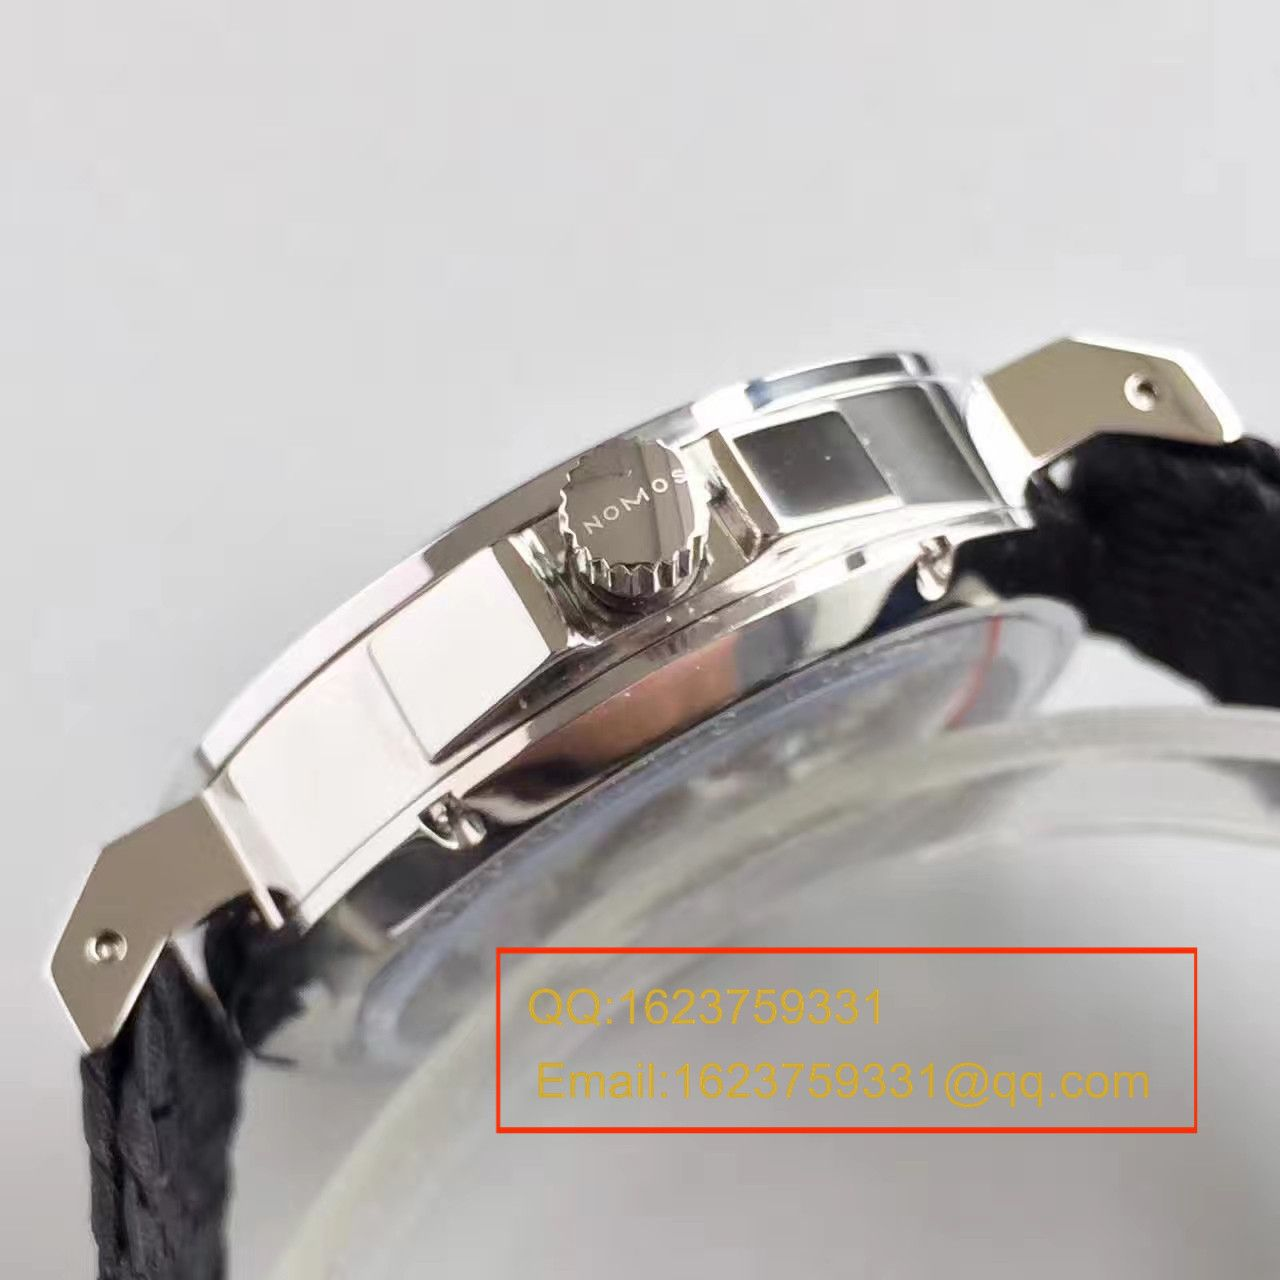 【OS厂一比一顶级复刻手表】NOMOS(诺莫斯)Ahoi系列 550/551/552/553首款潜水表搭配尼龙带腕表 / NO001